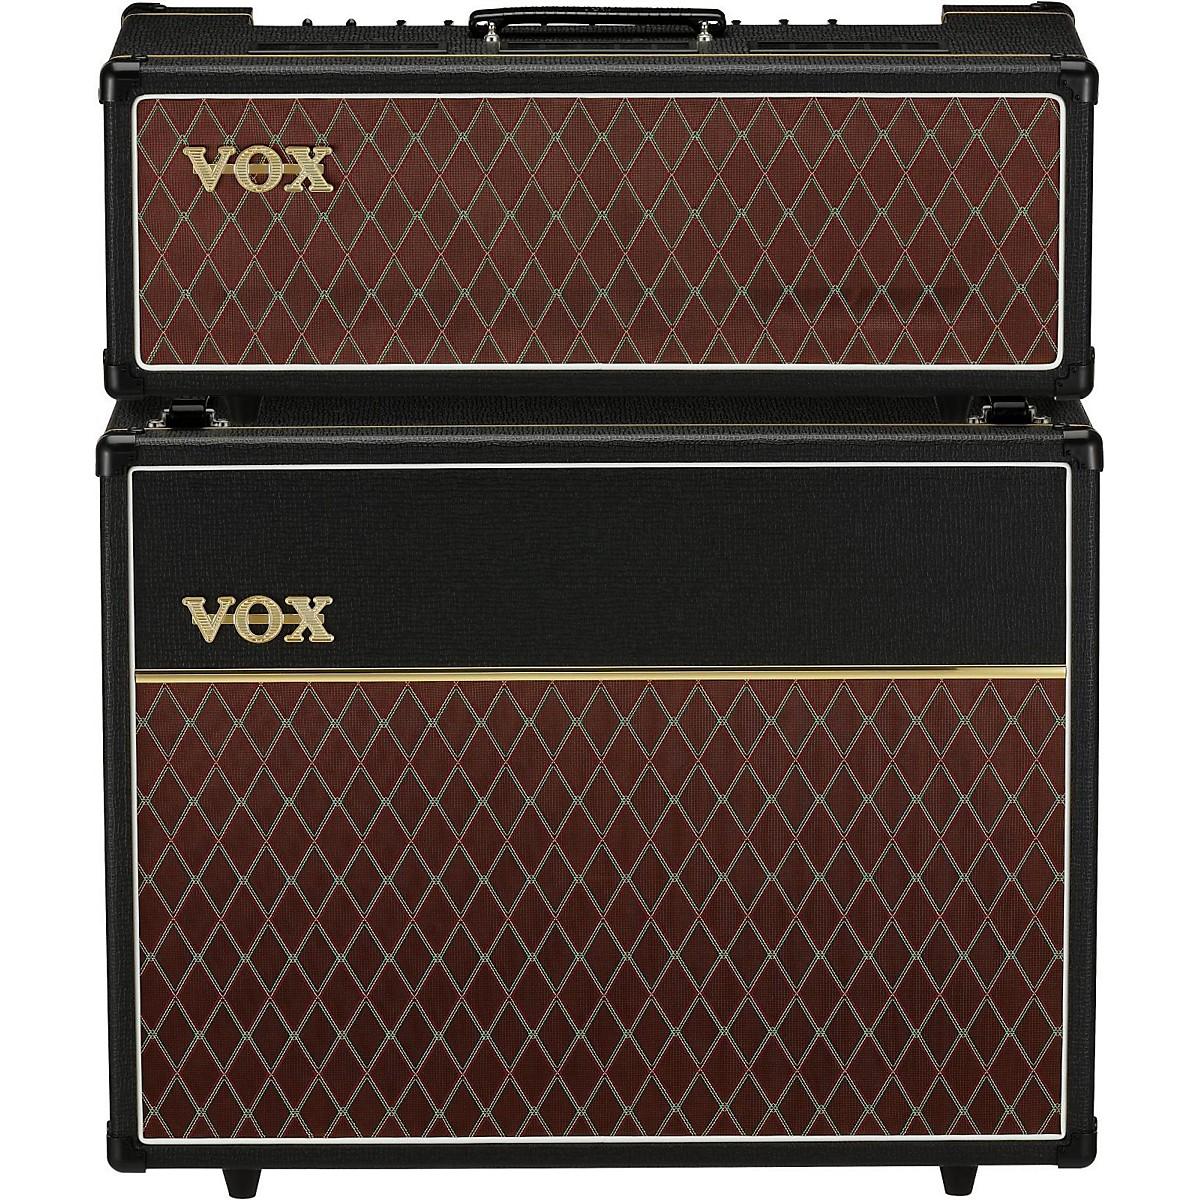 Vox 30w Custom Tube Guitar Amp Head with 2x12 Cabinet